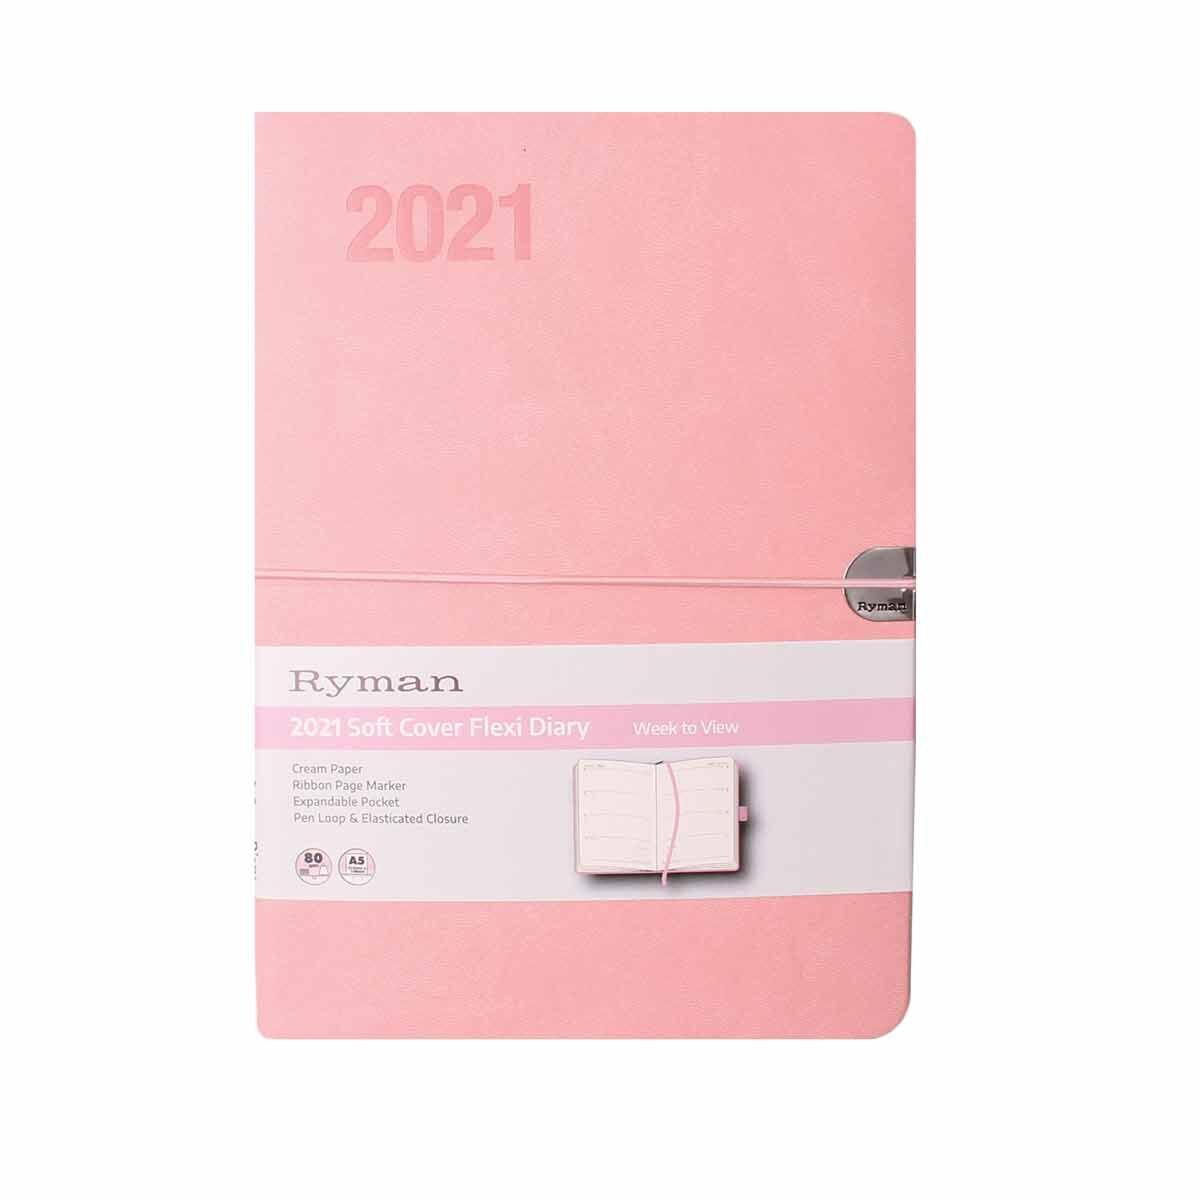 Ryman Flexi Diary Week to View A5 2021